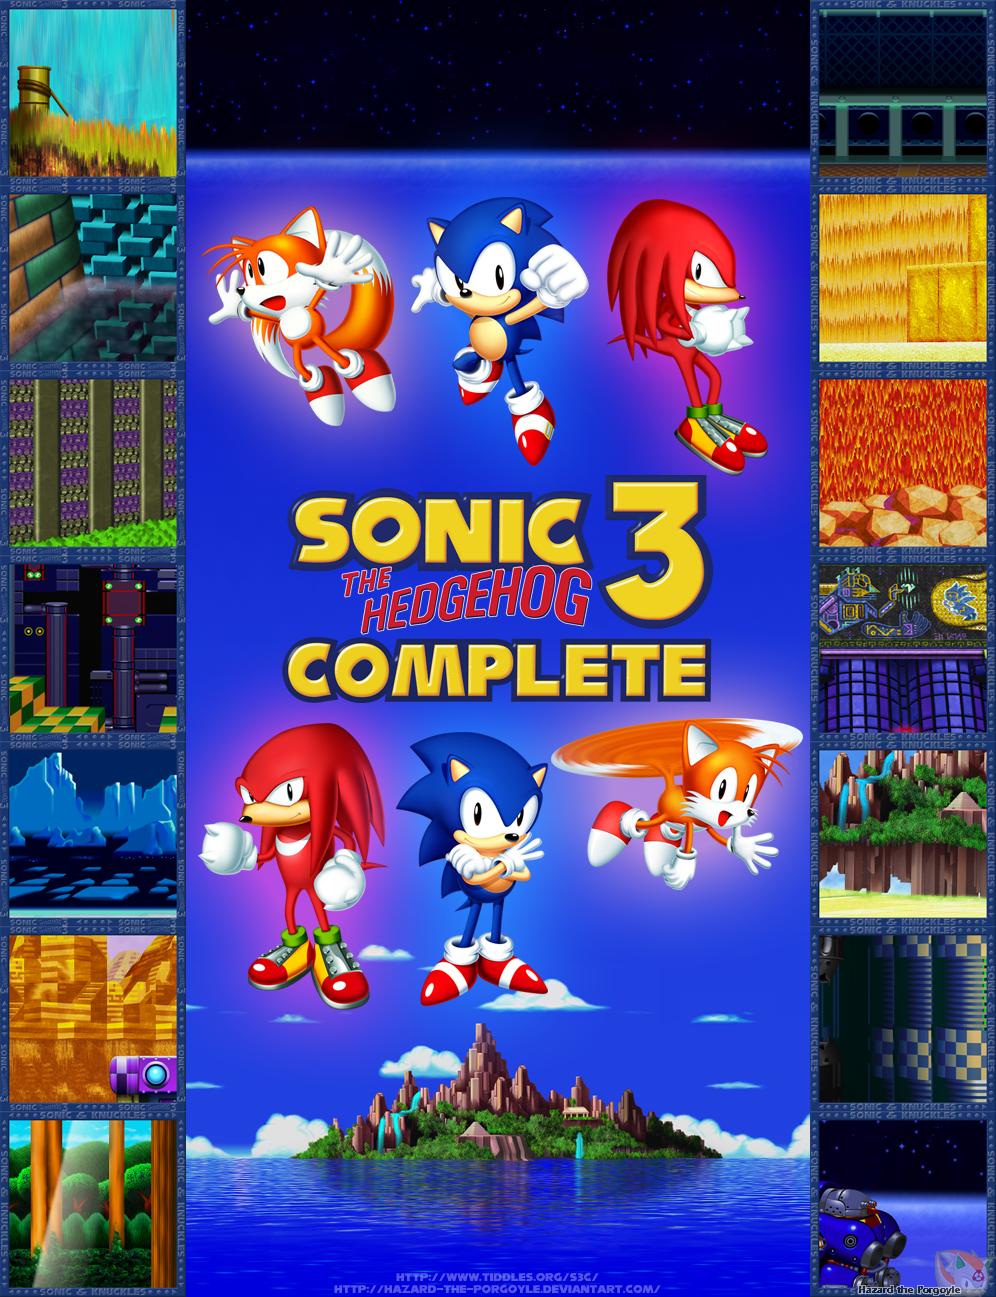 Sonic the Hedgehog 3 Complete - Across the Zones